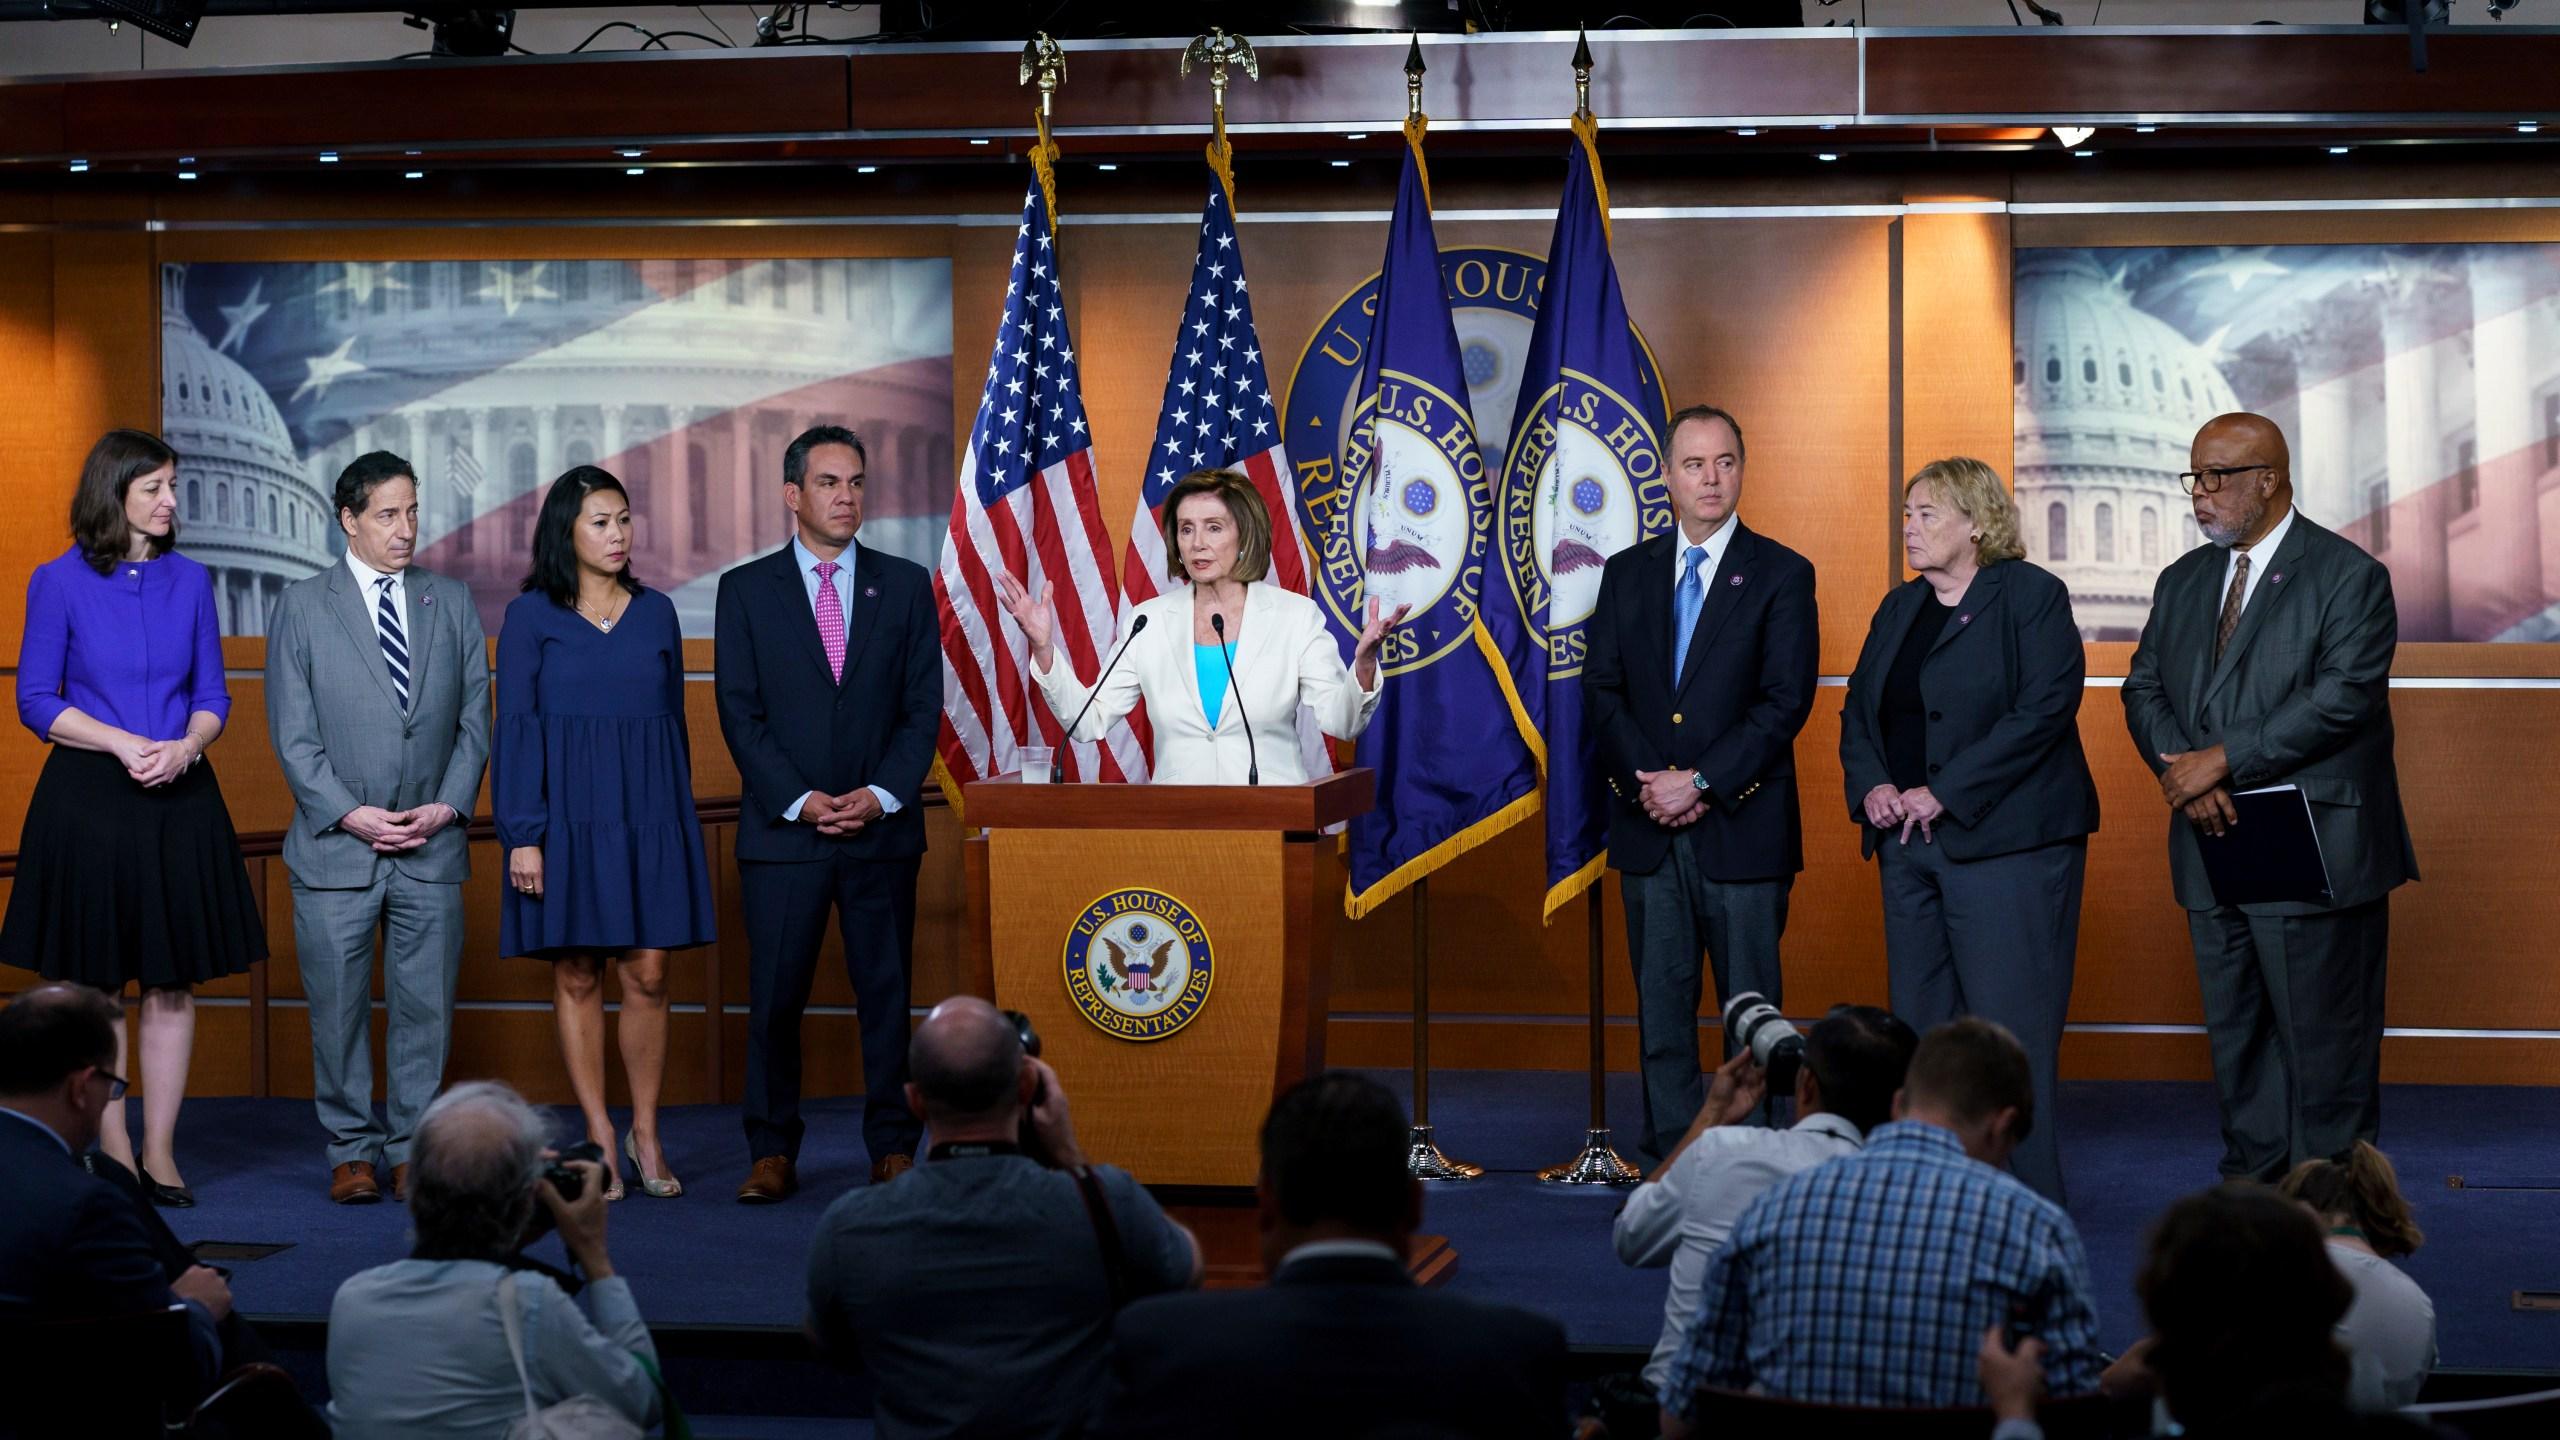 Nancy Pelosi, Elaine Luria, Pete Aguilar, Stephanie Murphy, Jamie Raskin, Adam Schiff, Zoe Lofgren, Bennie Thompson